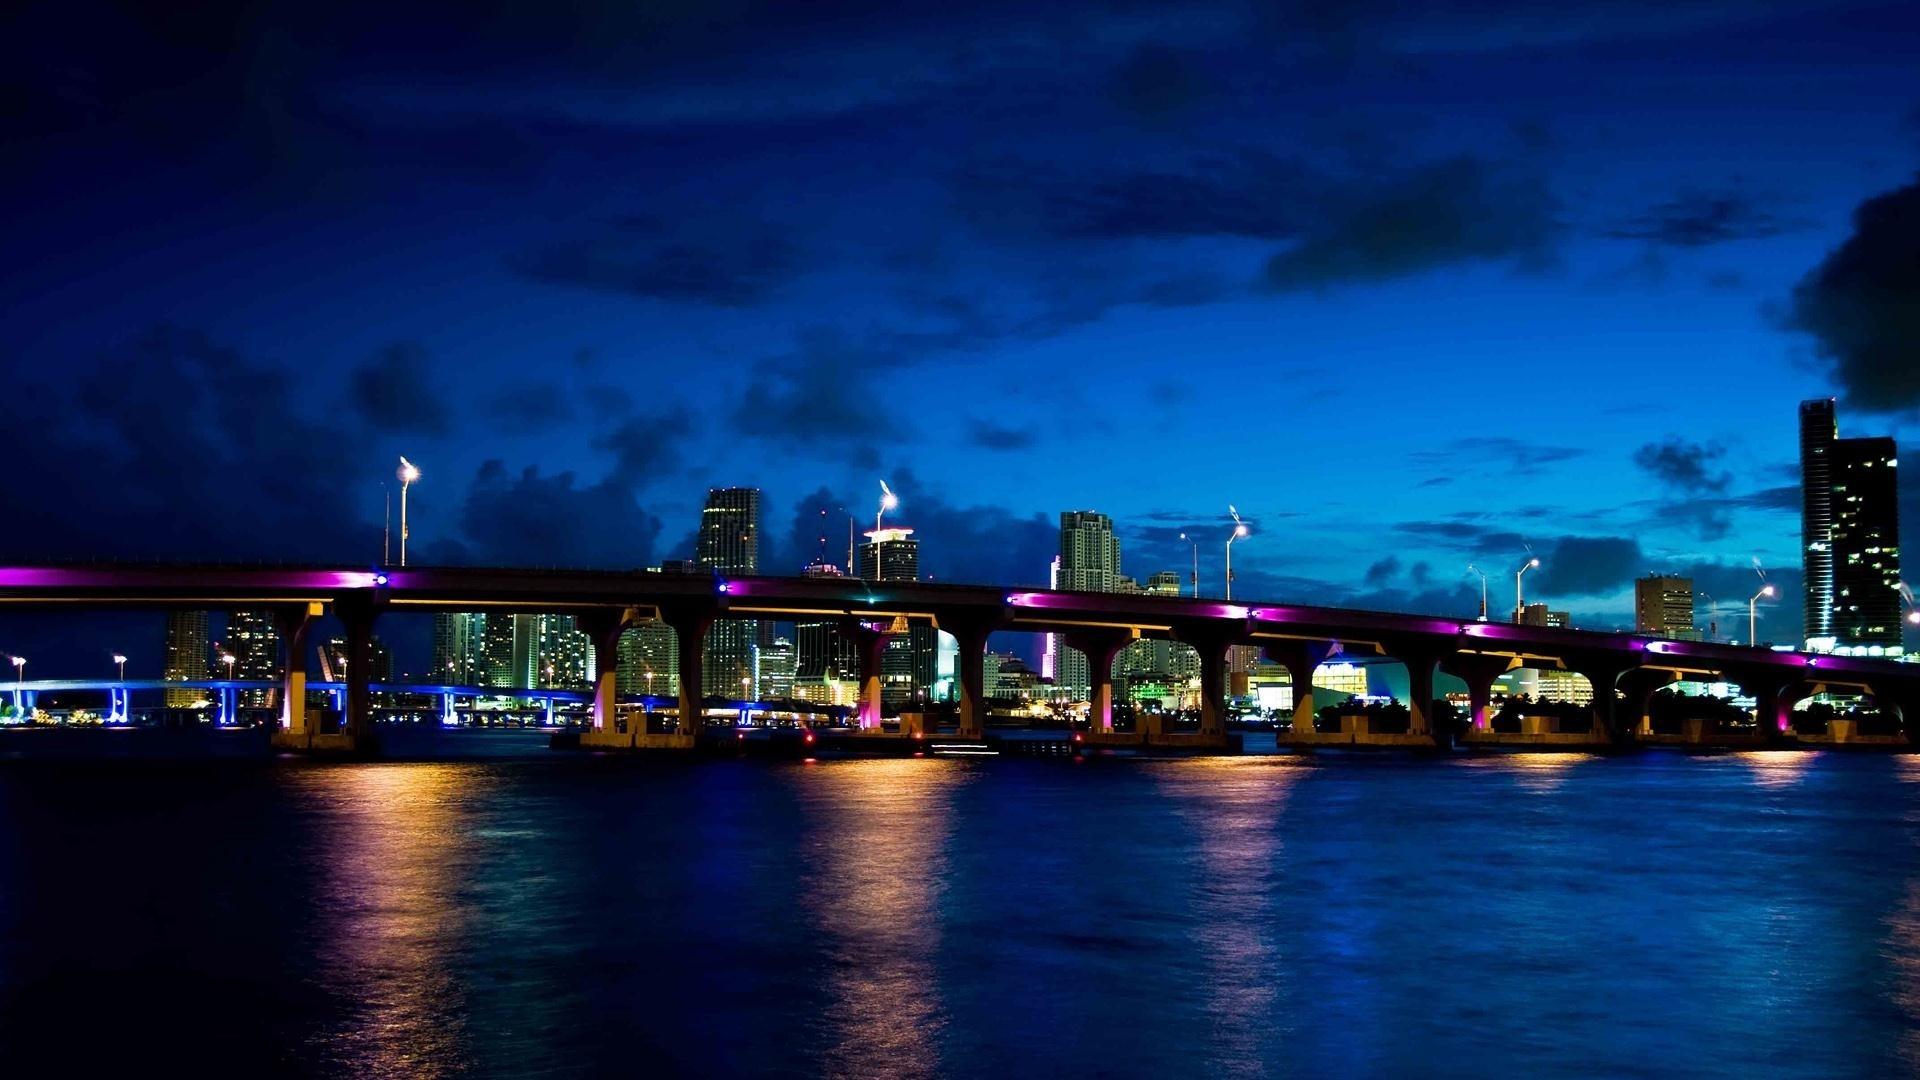 Bridge night city HD Desktop Wallpaper HD Desktop Wallpaper 1920x1080